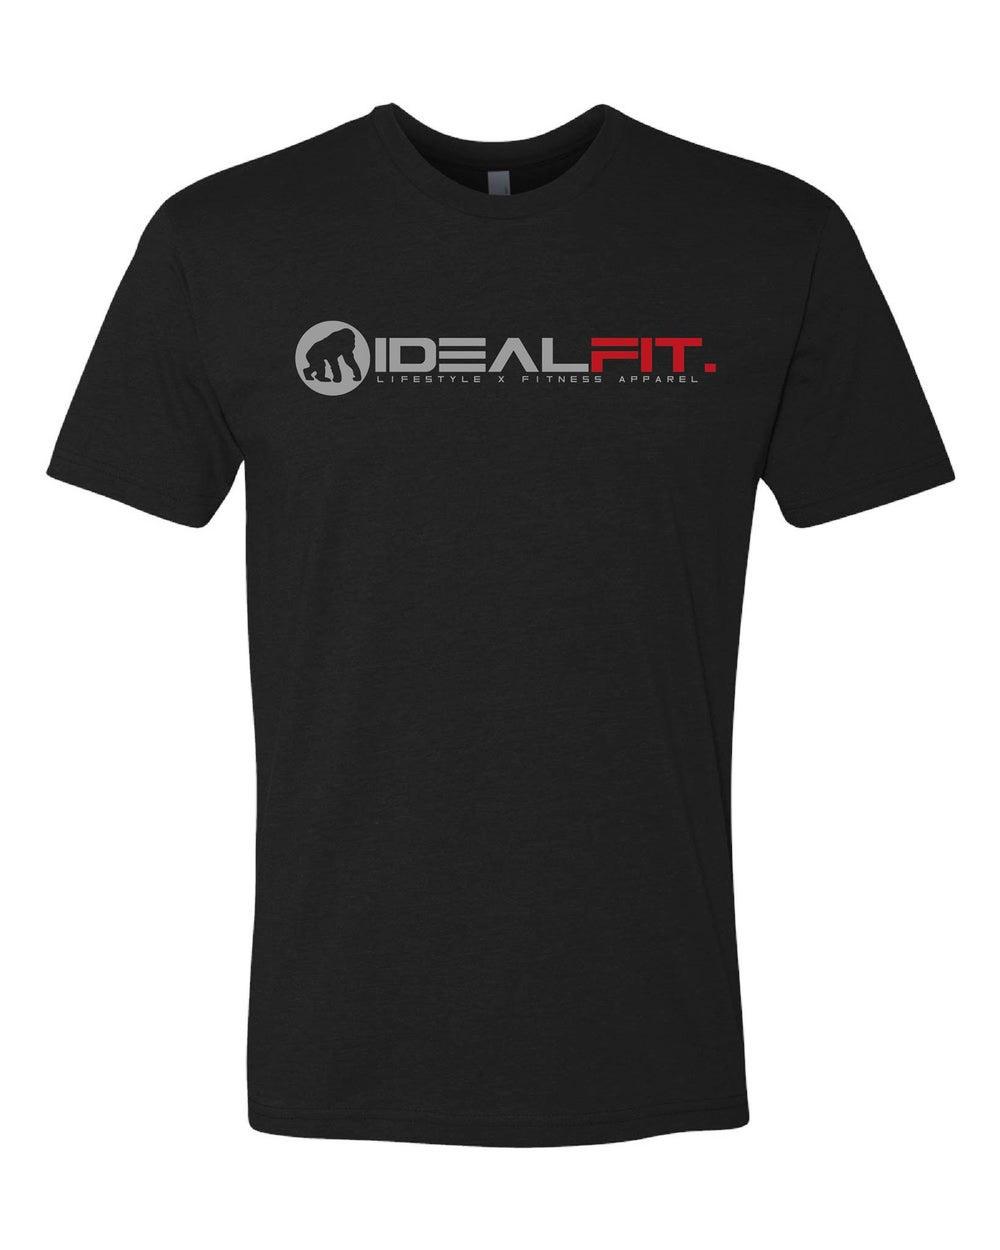 Image of Evolution Shirt - $10